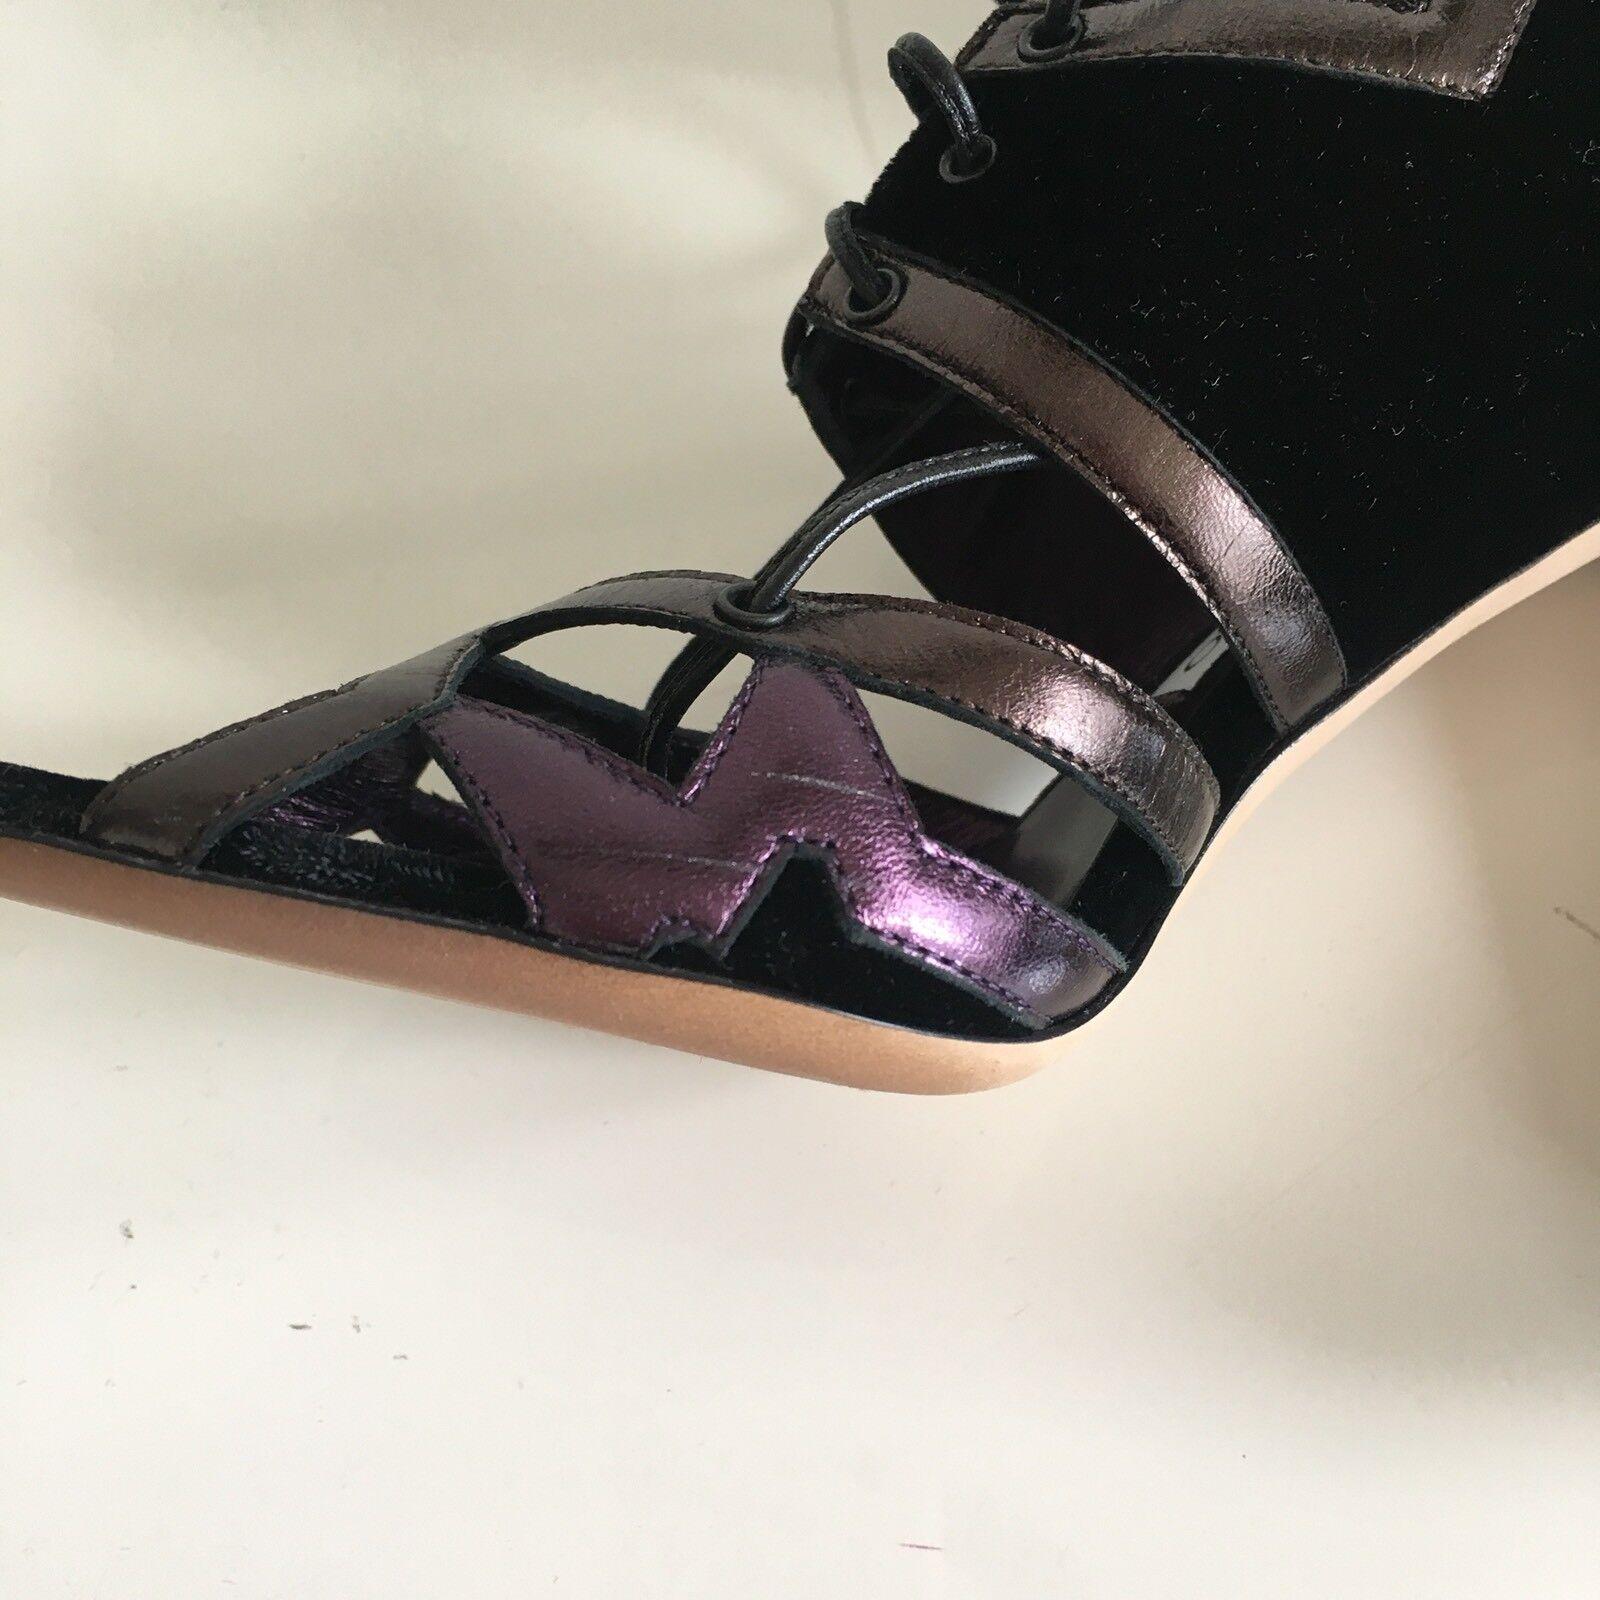 Jimmy Choo Woman's High Heels sandals, Taille 6.5US, 36.5EU, 36.5EU, 36.5EU, NEW 2b8693